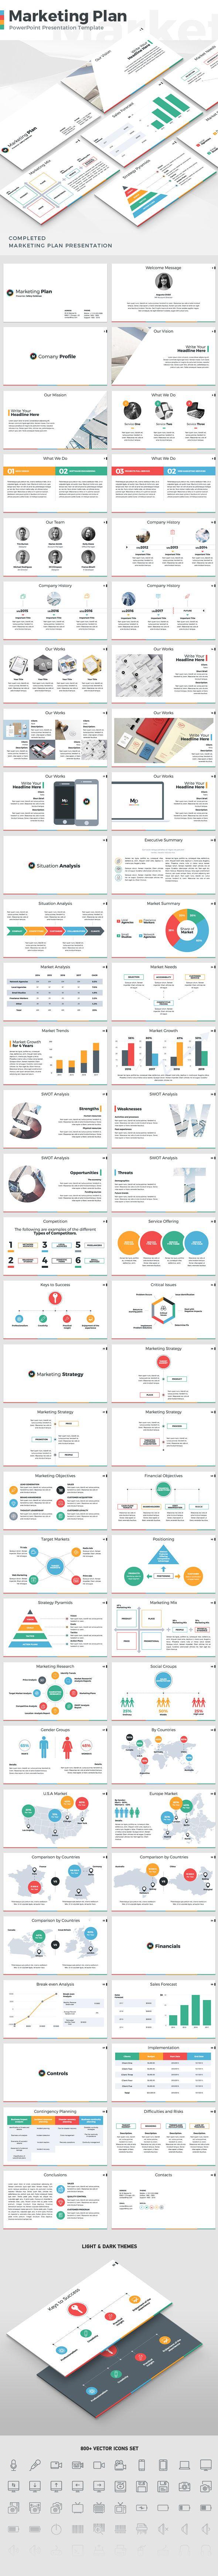 marketing plan powerpoint presentation template powerpoint templates